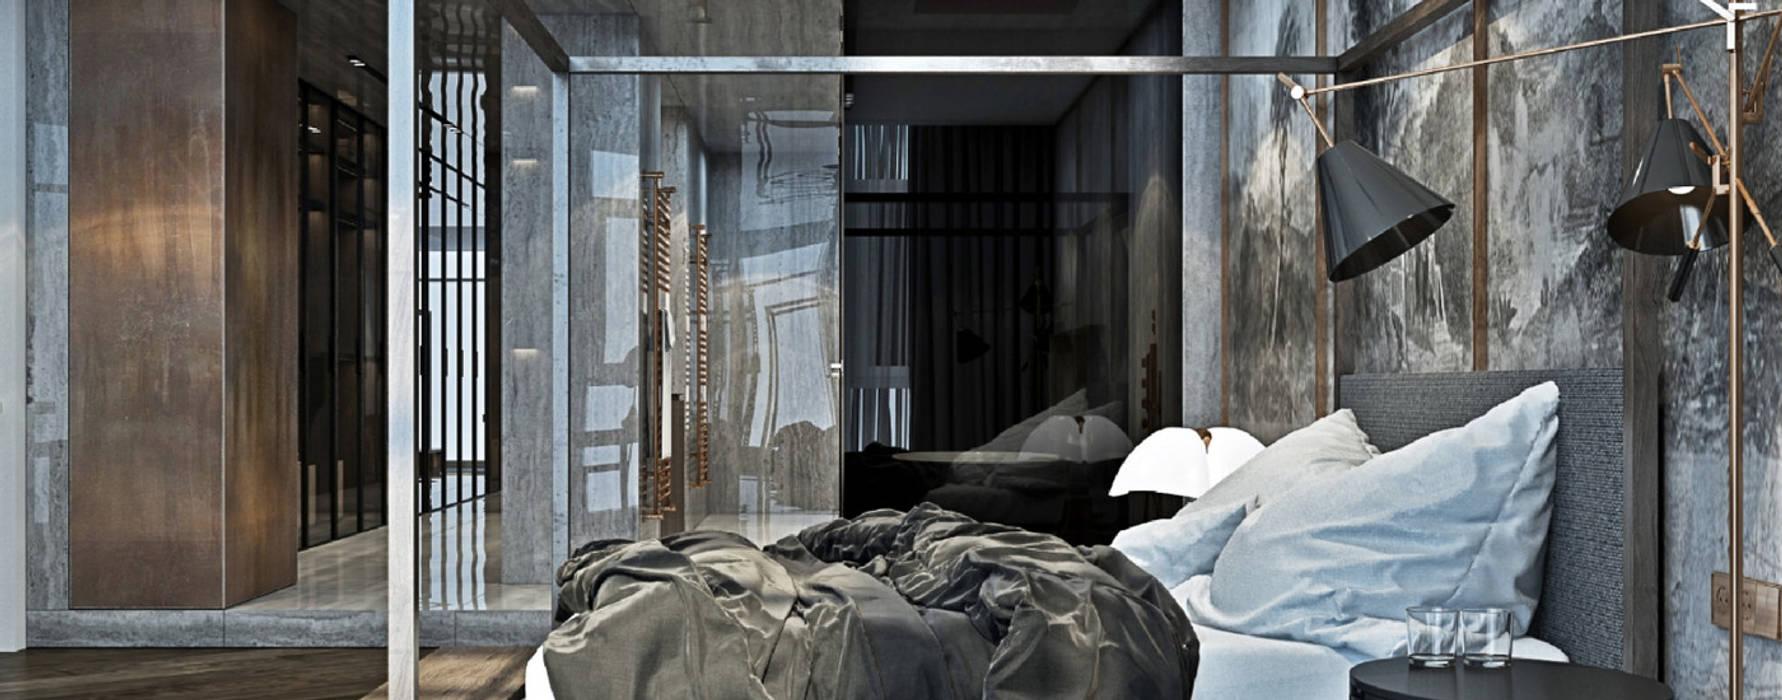 United States House by YØDEZEEN DelightFULL Small bedroom Copper/Bronze/Brass Black